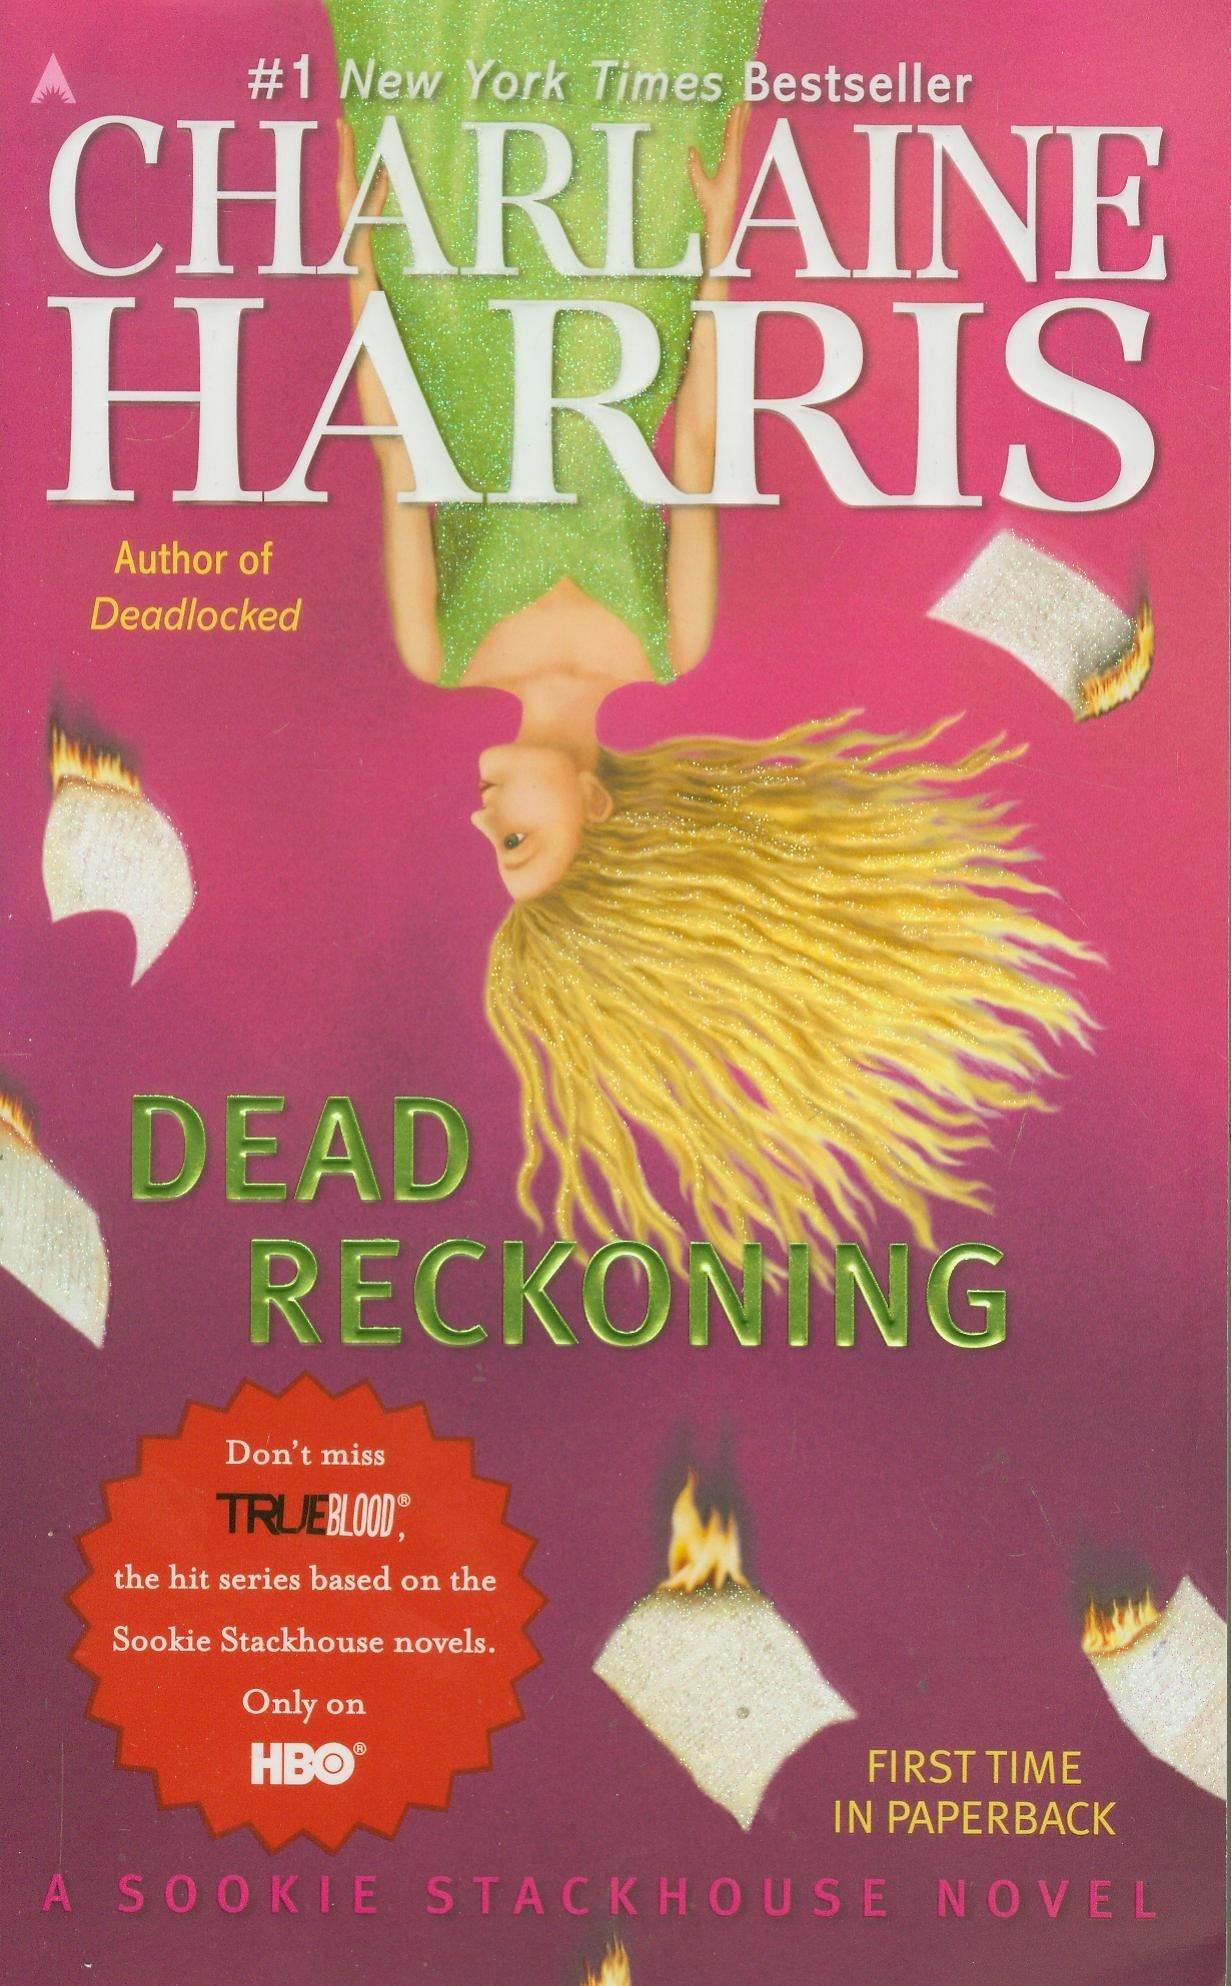 True Blood, Book 11)  (9781937007355): Charlaine Harris: Books